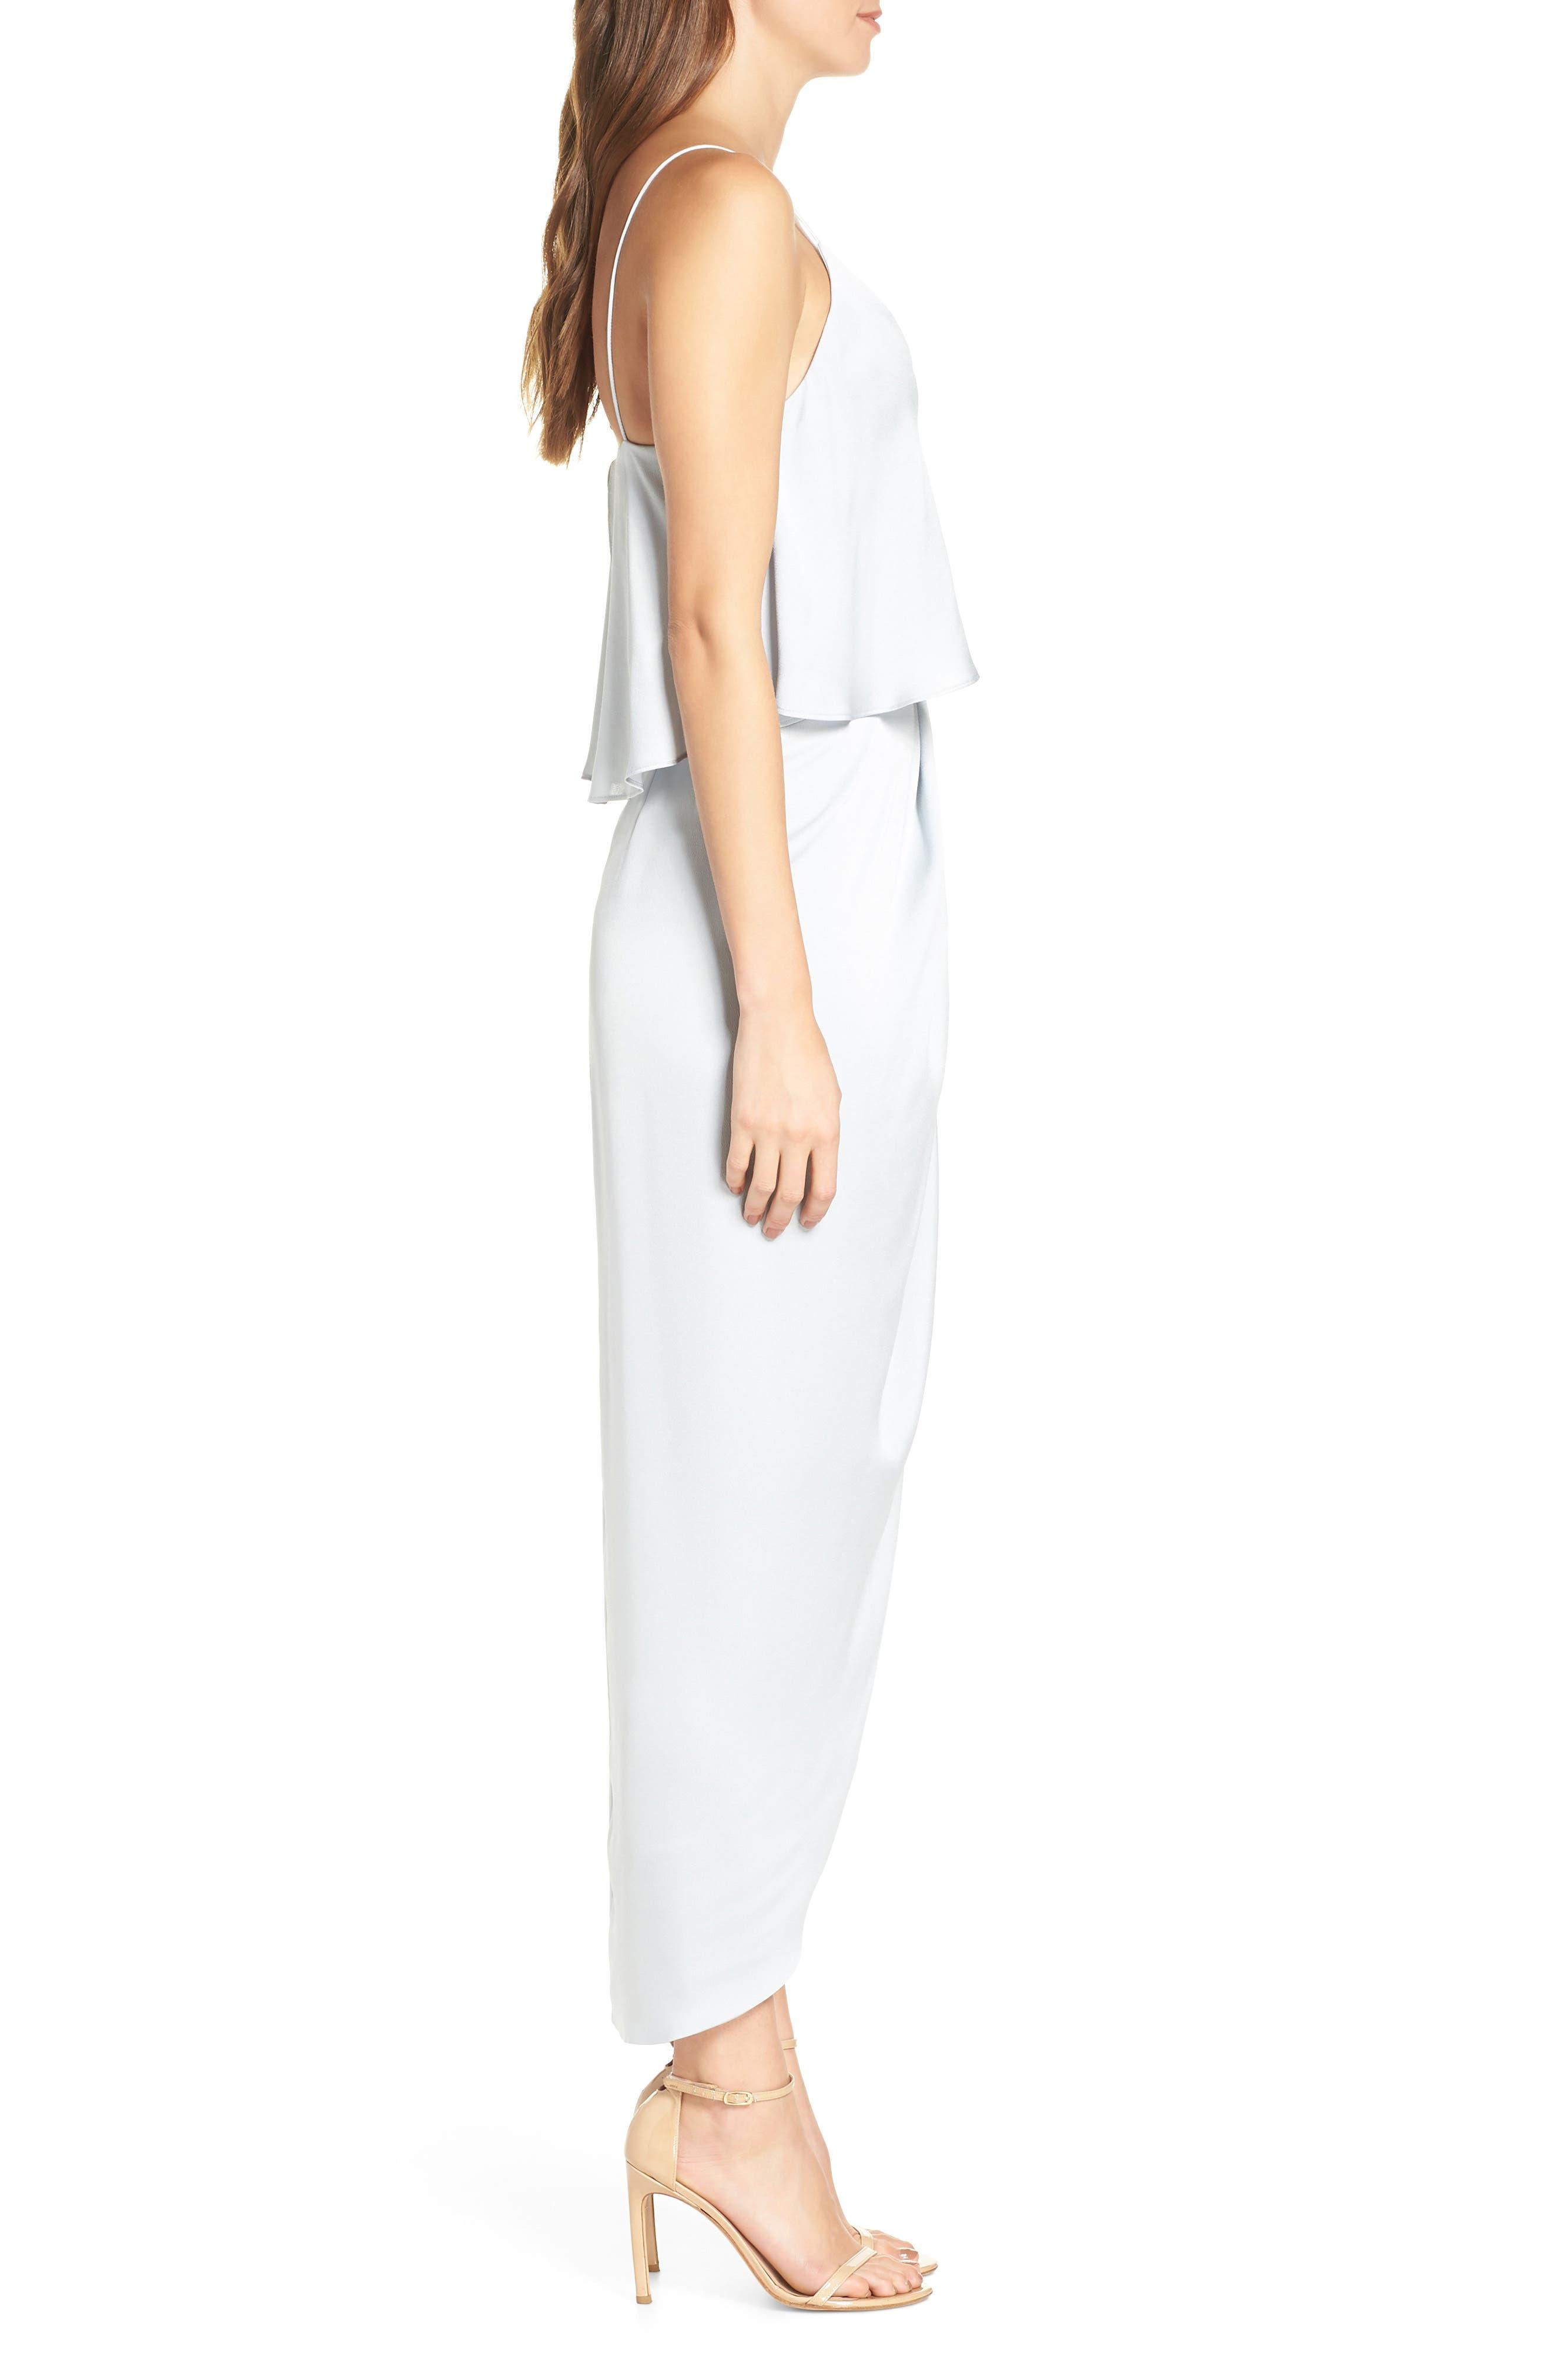 SHONA JOY, Luxe Frill Tulip Hem Maxi Dress, Alternate thumbnail 4, color, CLOUD